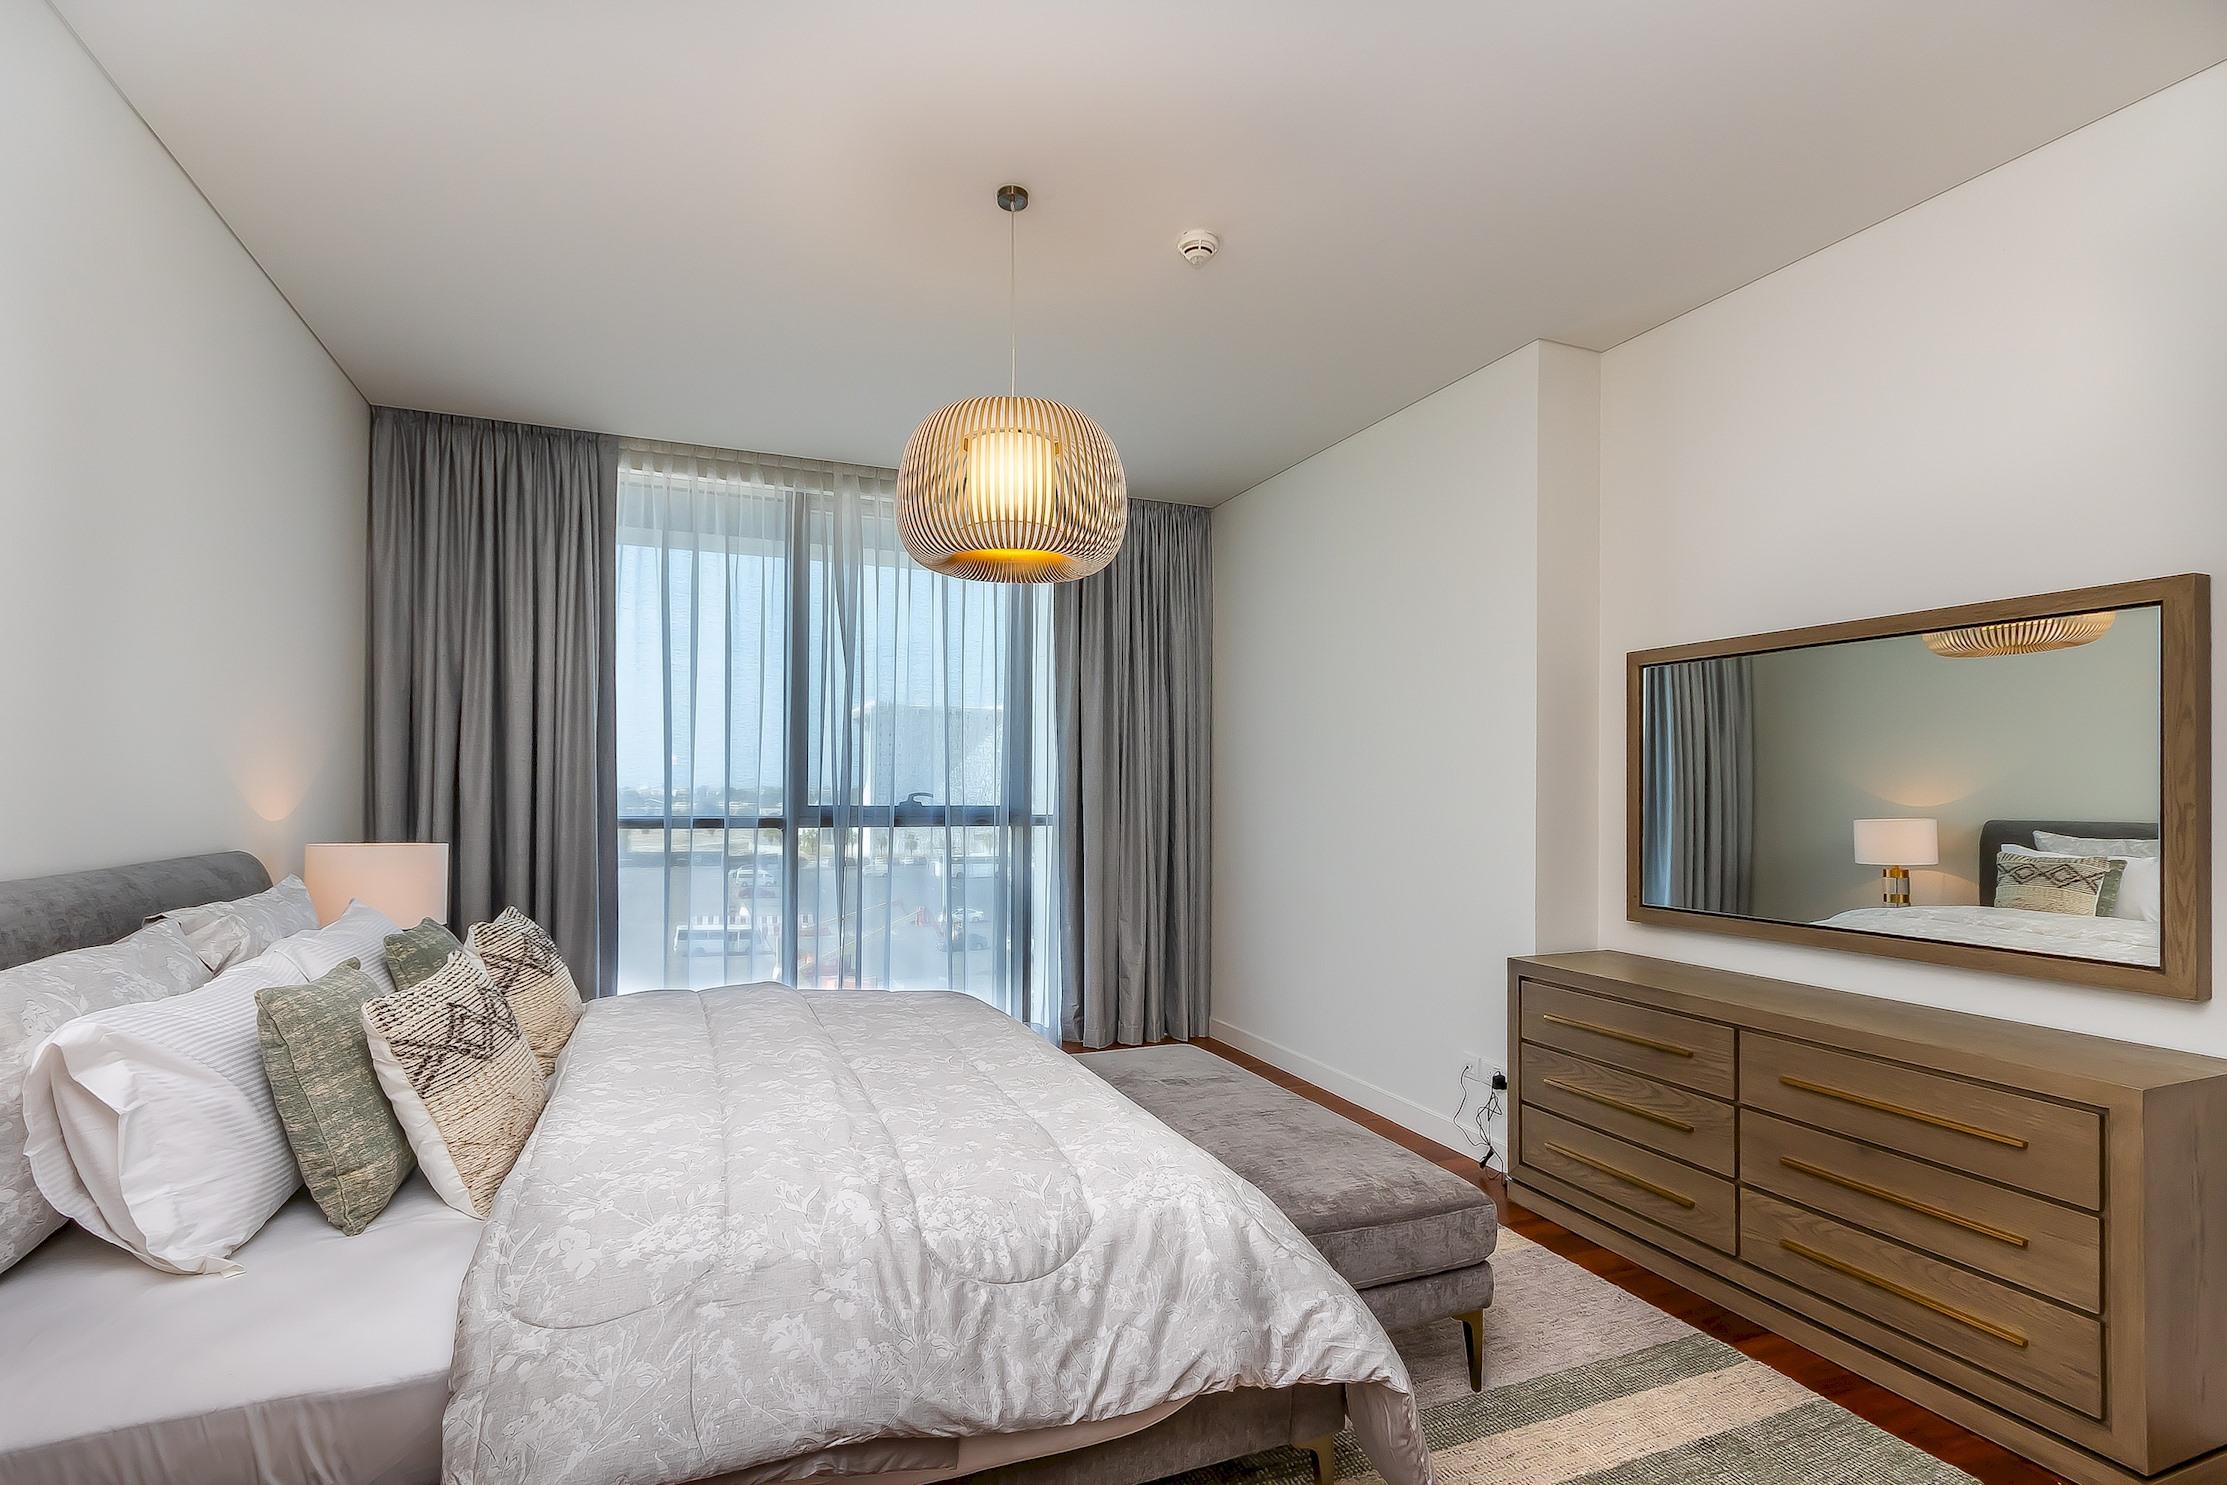 Apartment  Remarkable Value   Unbeatable Location  3 Beds City Walk B 10 309 photo 24142314